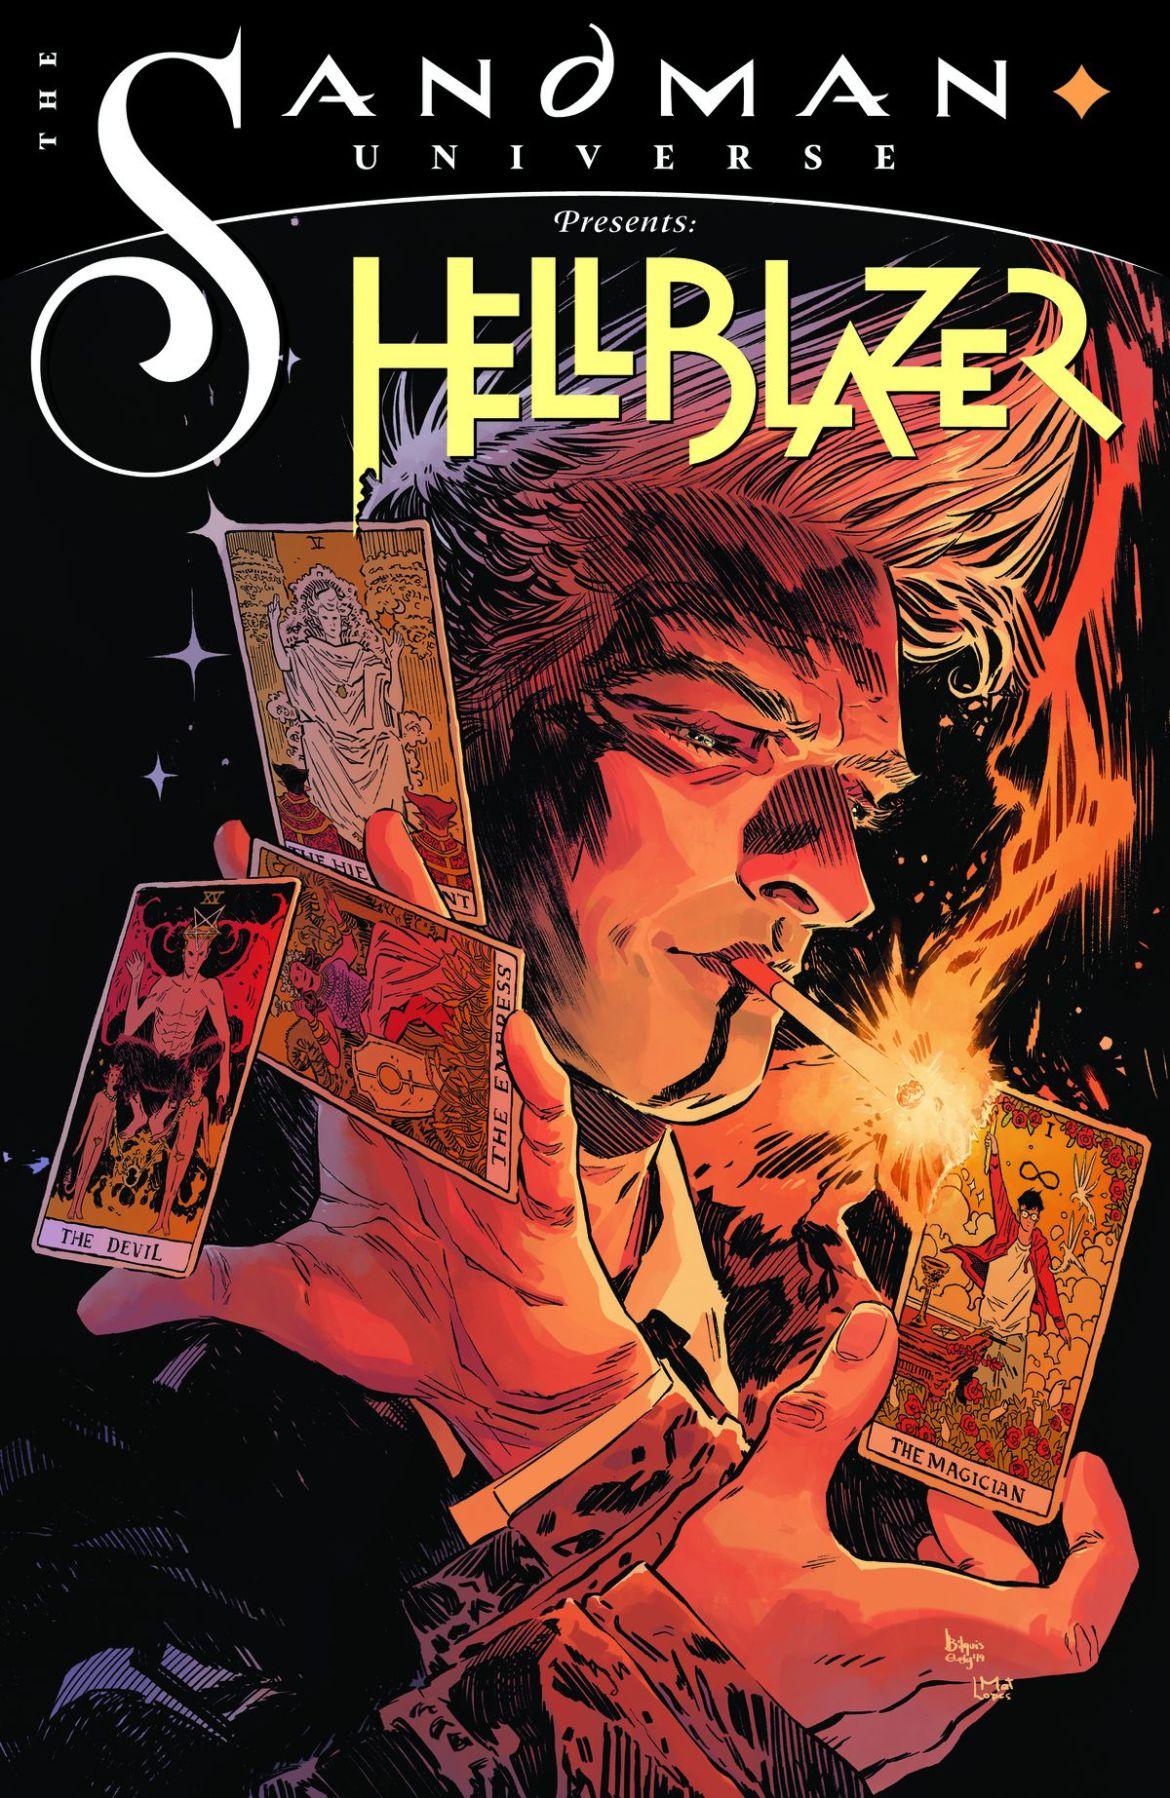 John Constantine on the cover of The Sandman Universe Presents Hellblazer #1, DC Comics (2019).